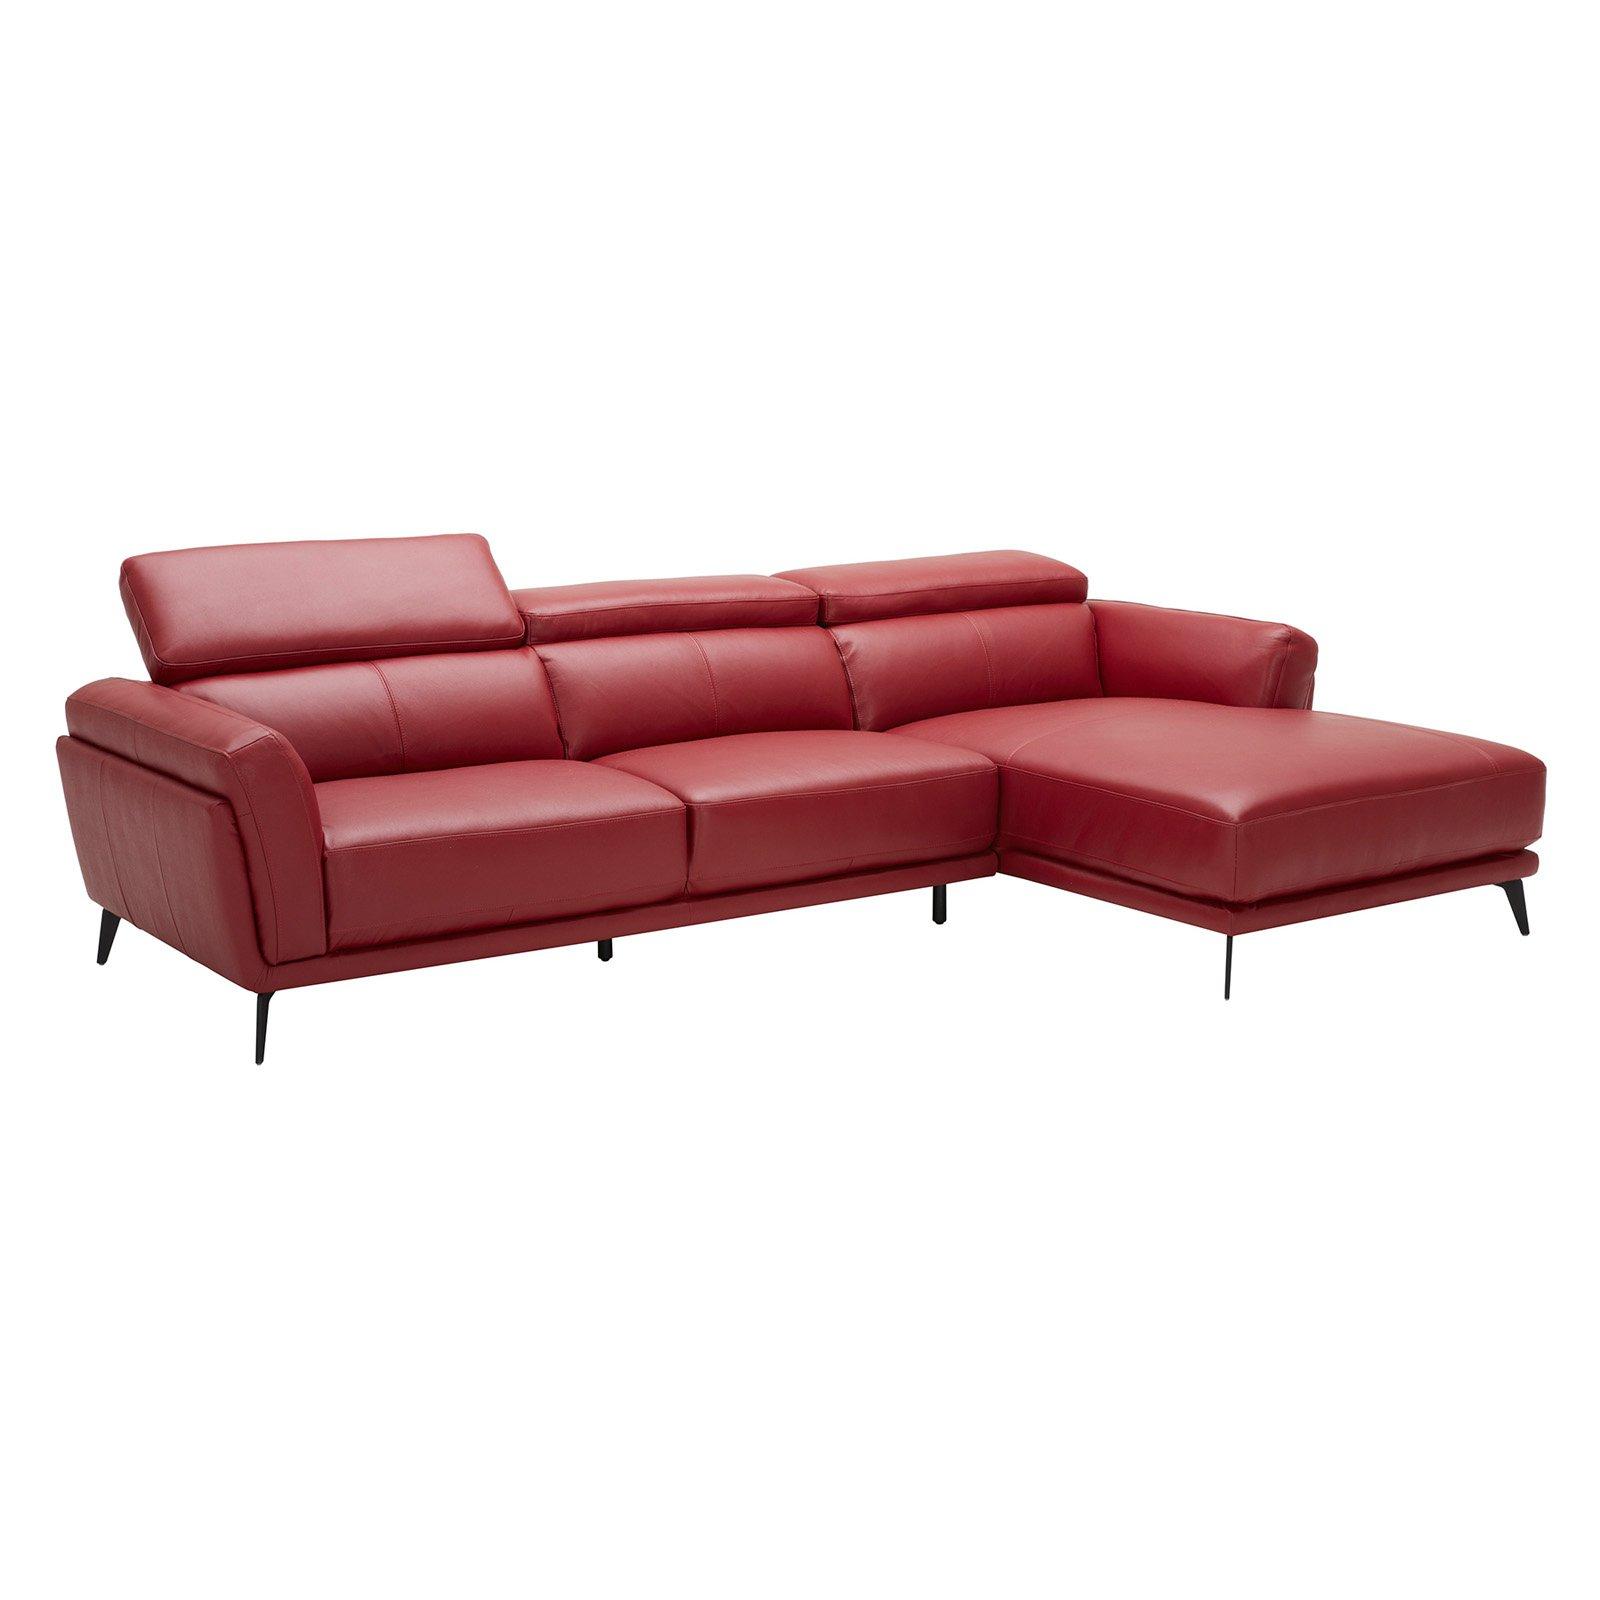 Where Is American Eagle Furniture Made: American Eagle Furniture Monroe Collection Sectional Sofa